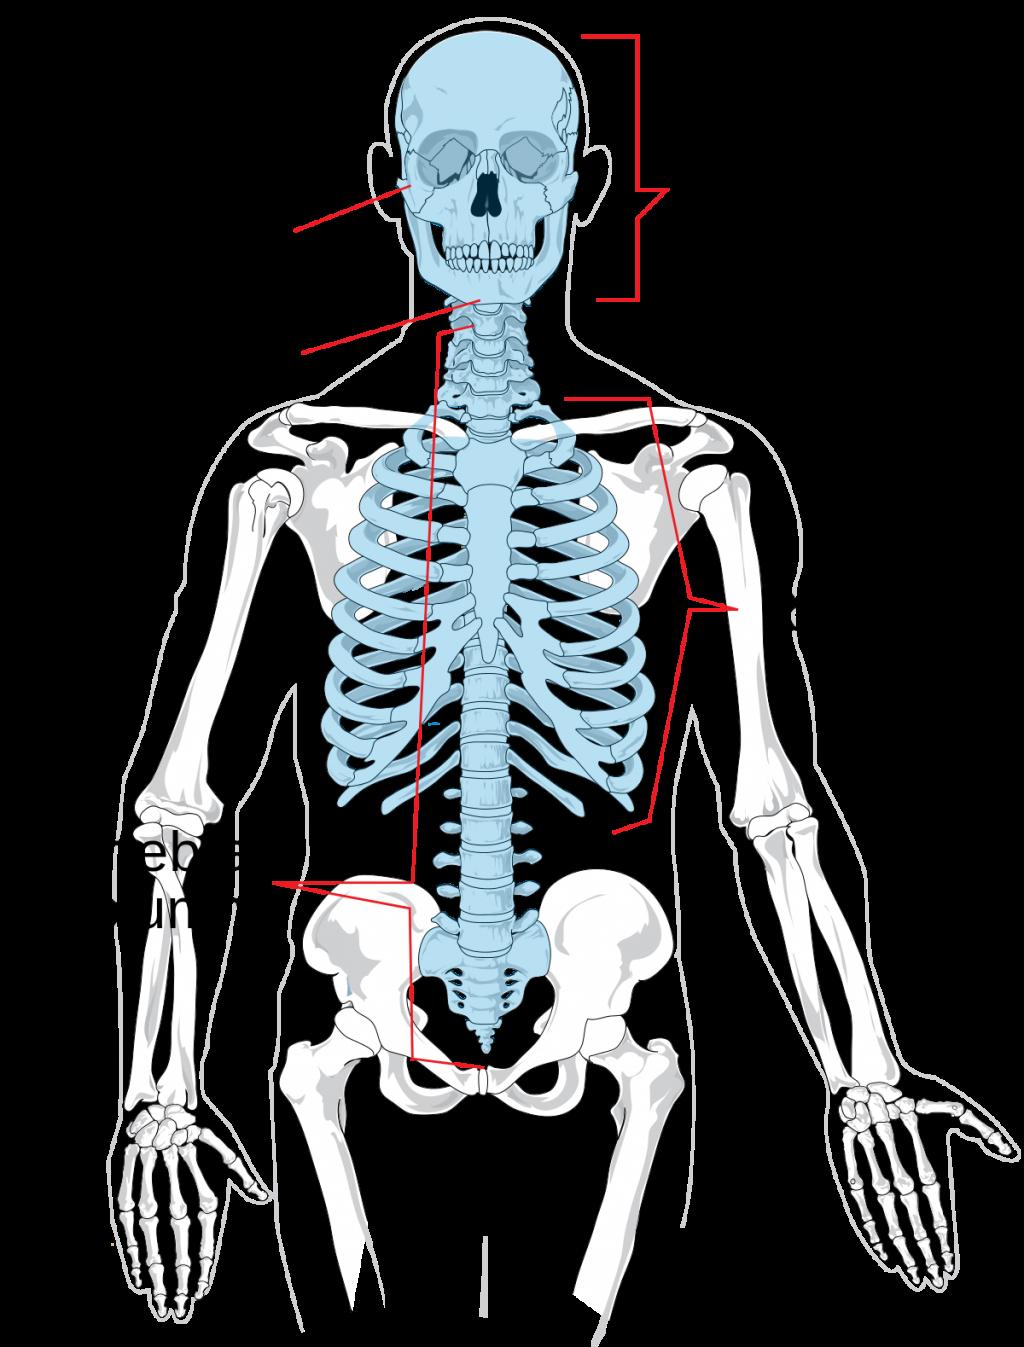 Skeletal System Diagram Skeletal System Diagrams Printable Diagram Flowcharts Flow Chart